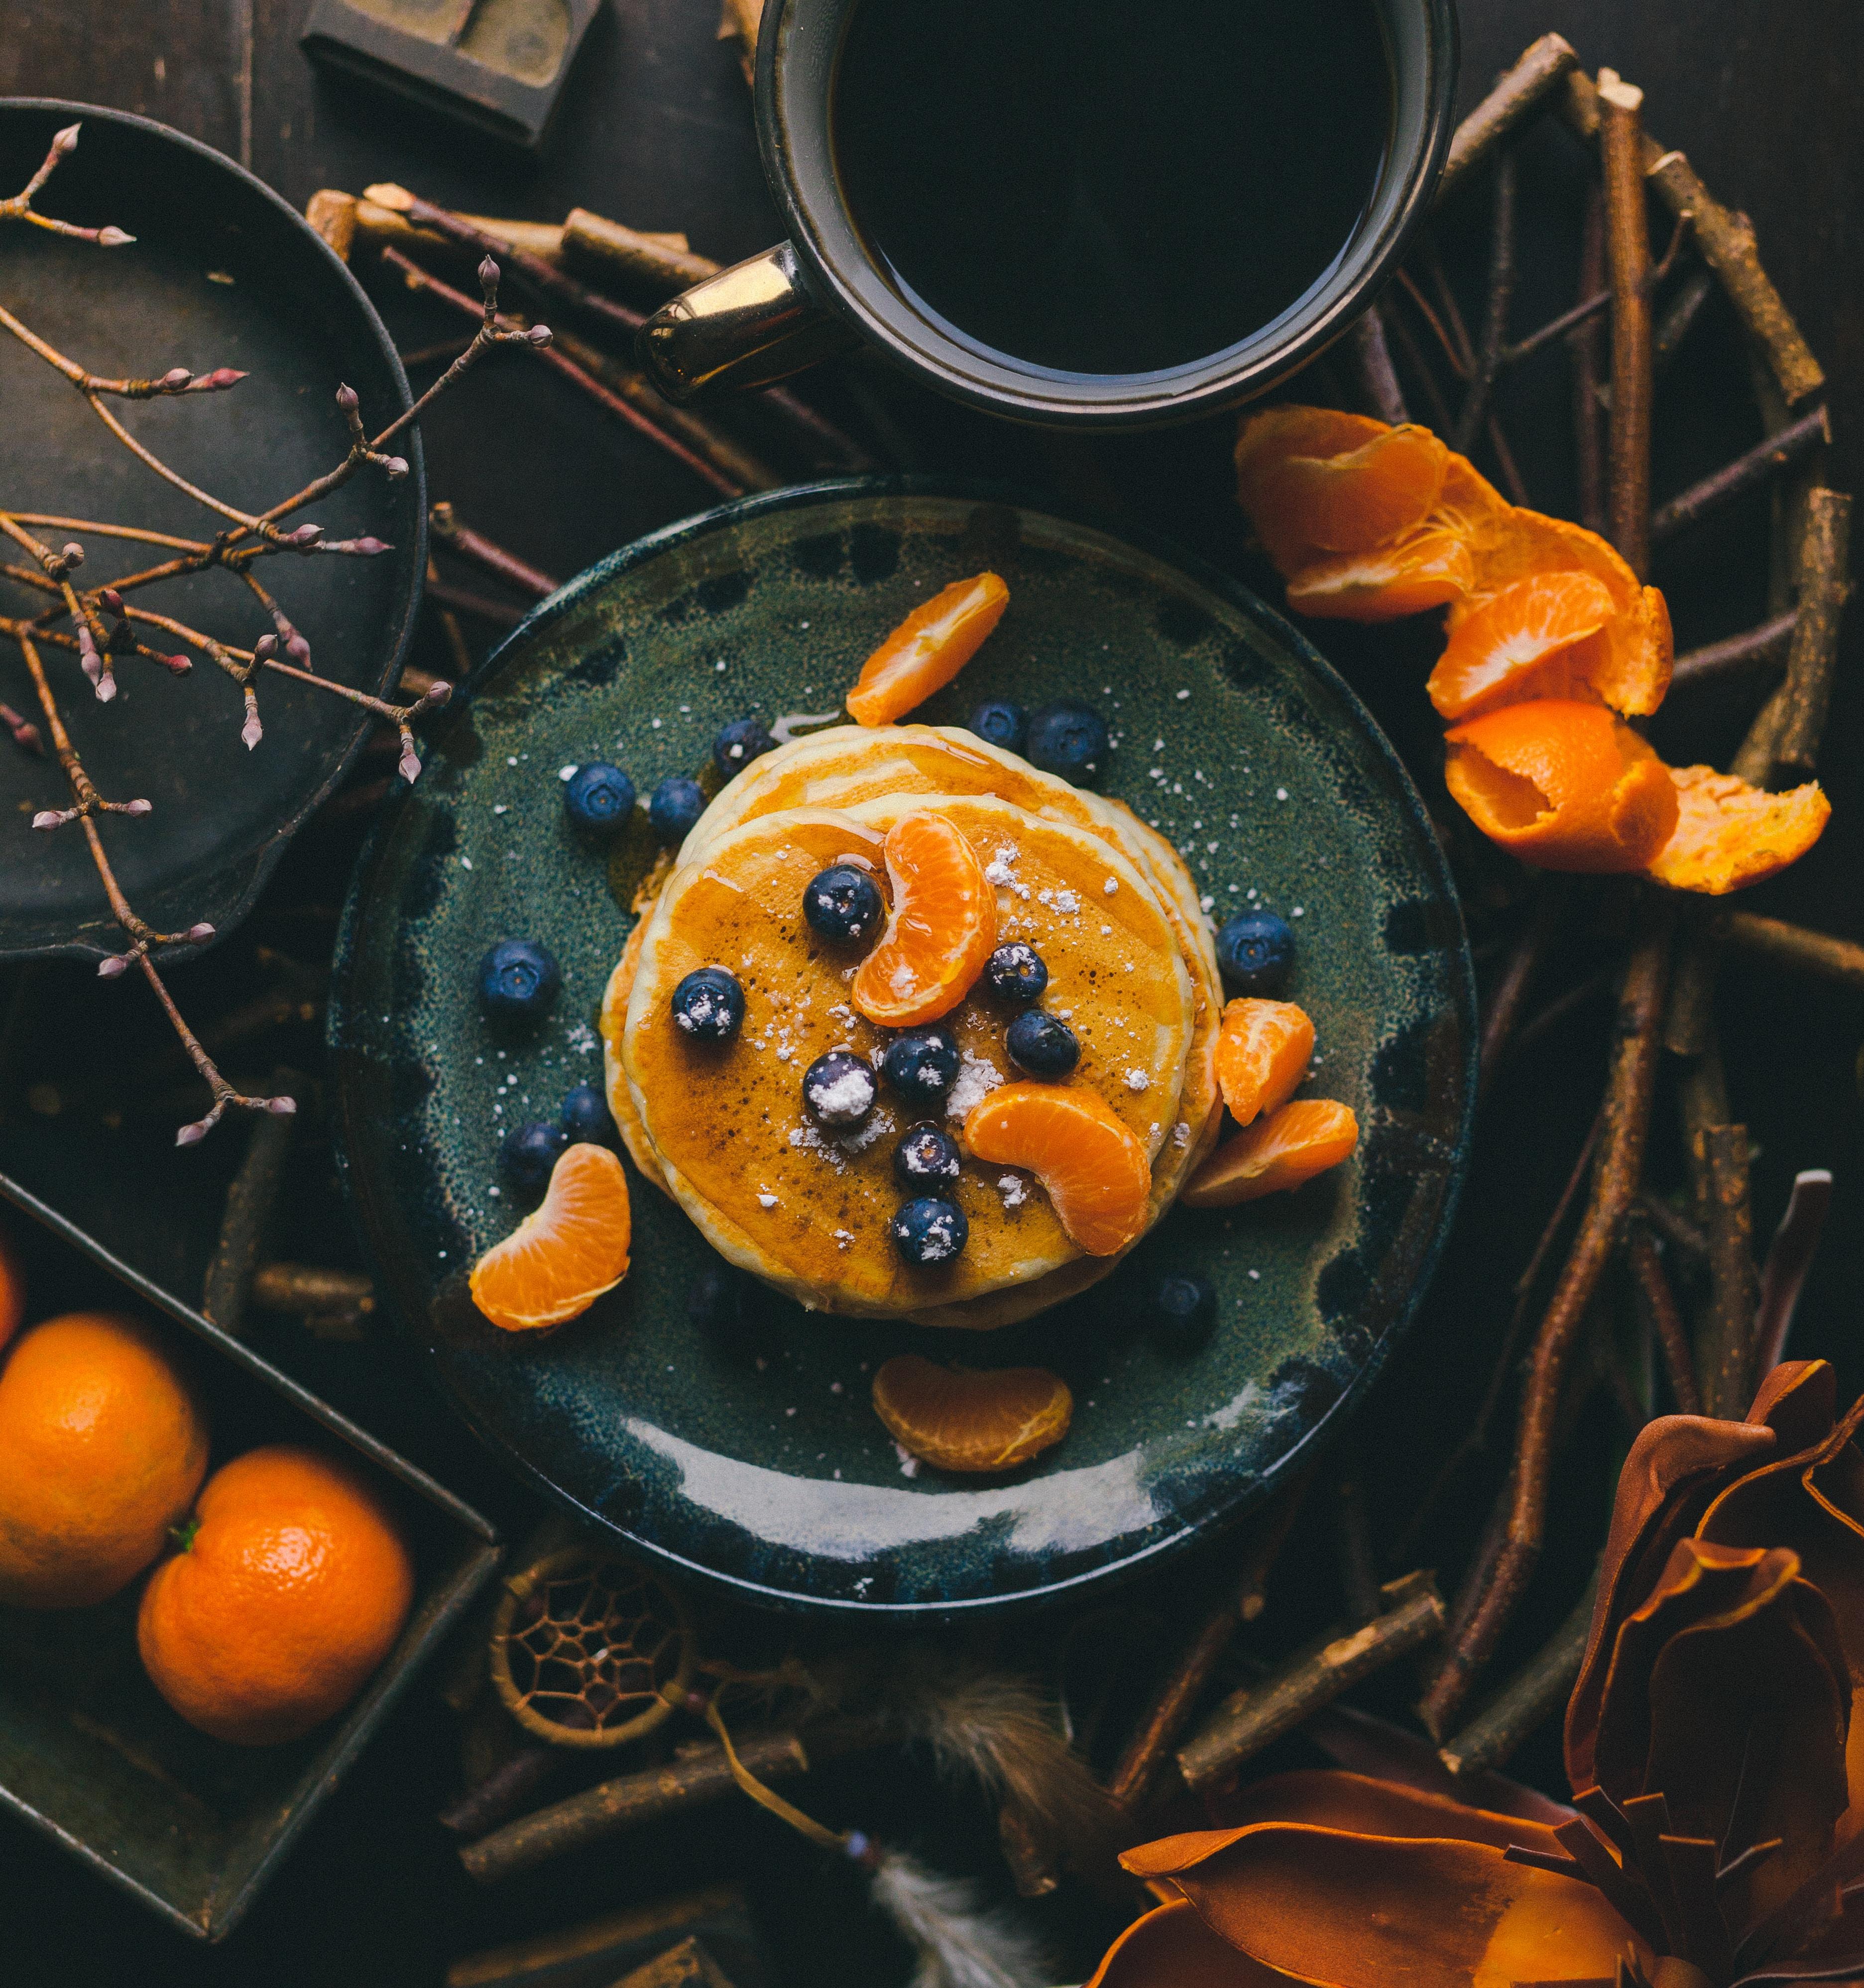 Homemade pancake